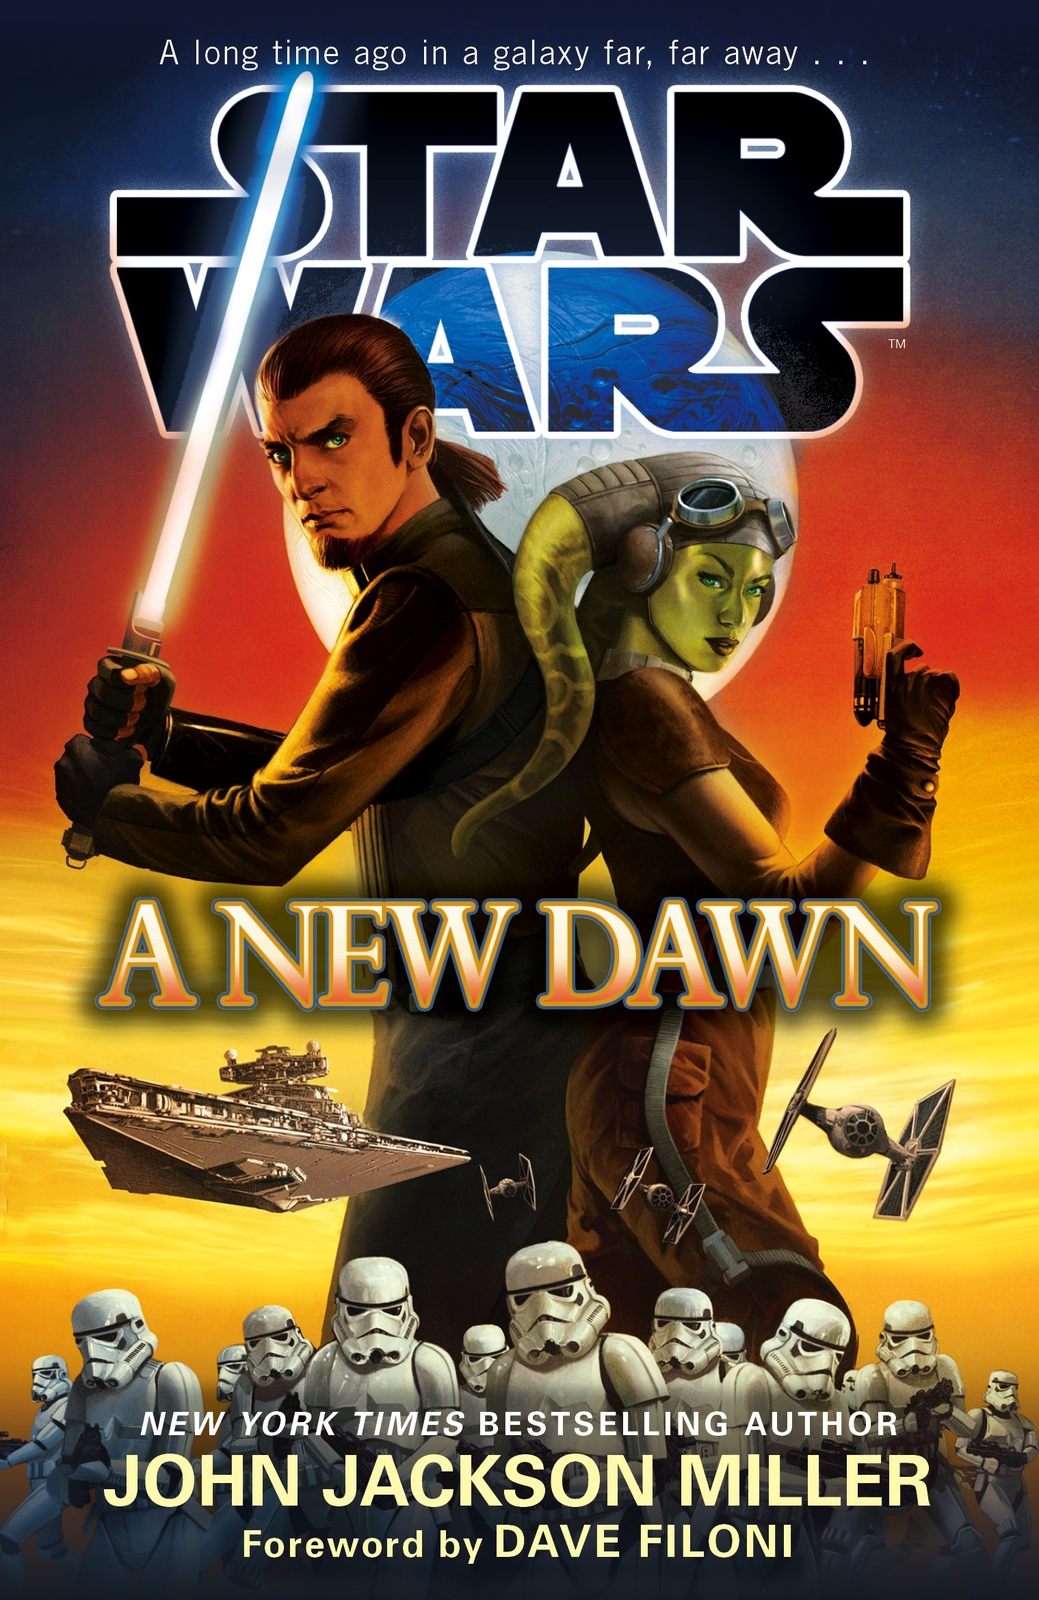 Star Wars: A New Dawn image